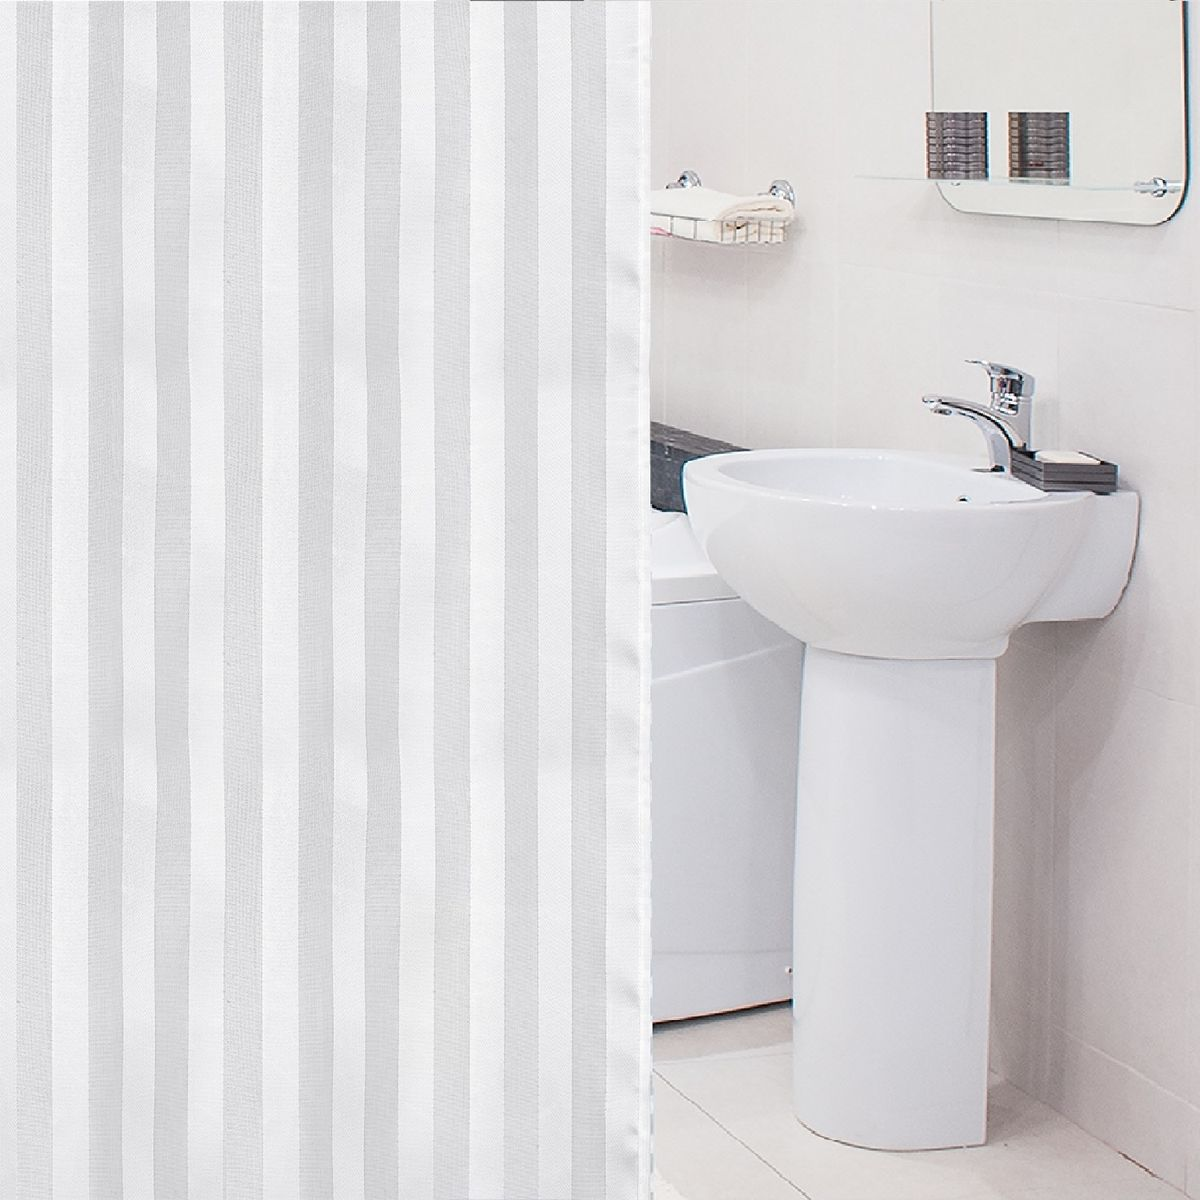 Штора для ванной комнаты Tatkraft Harmony, с кольцами, 180 х 180 см полка для ванной комнаты tatkraft mega lock vena цвет серый металлик